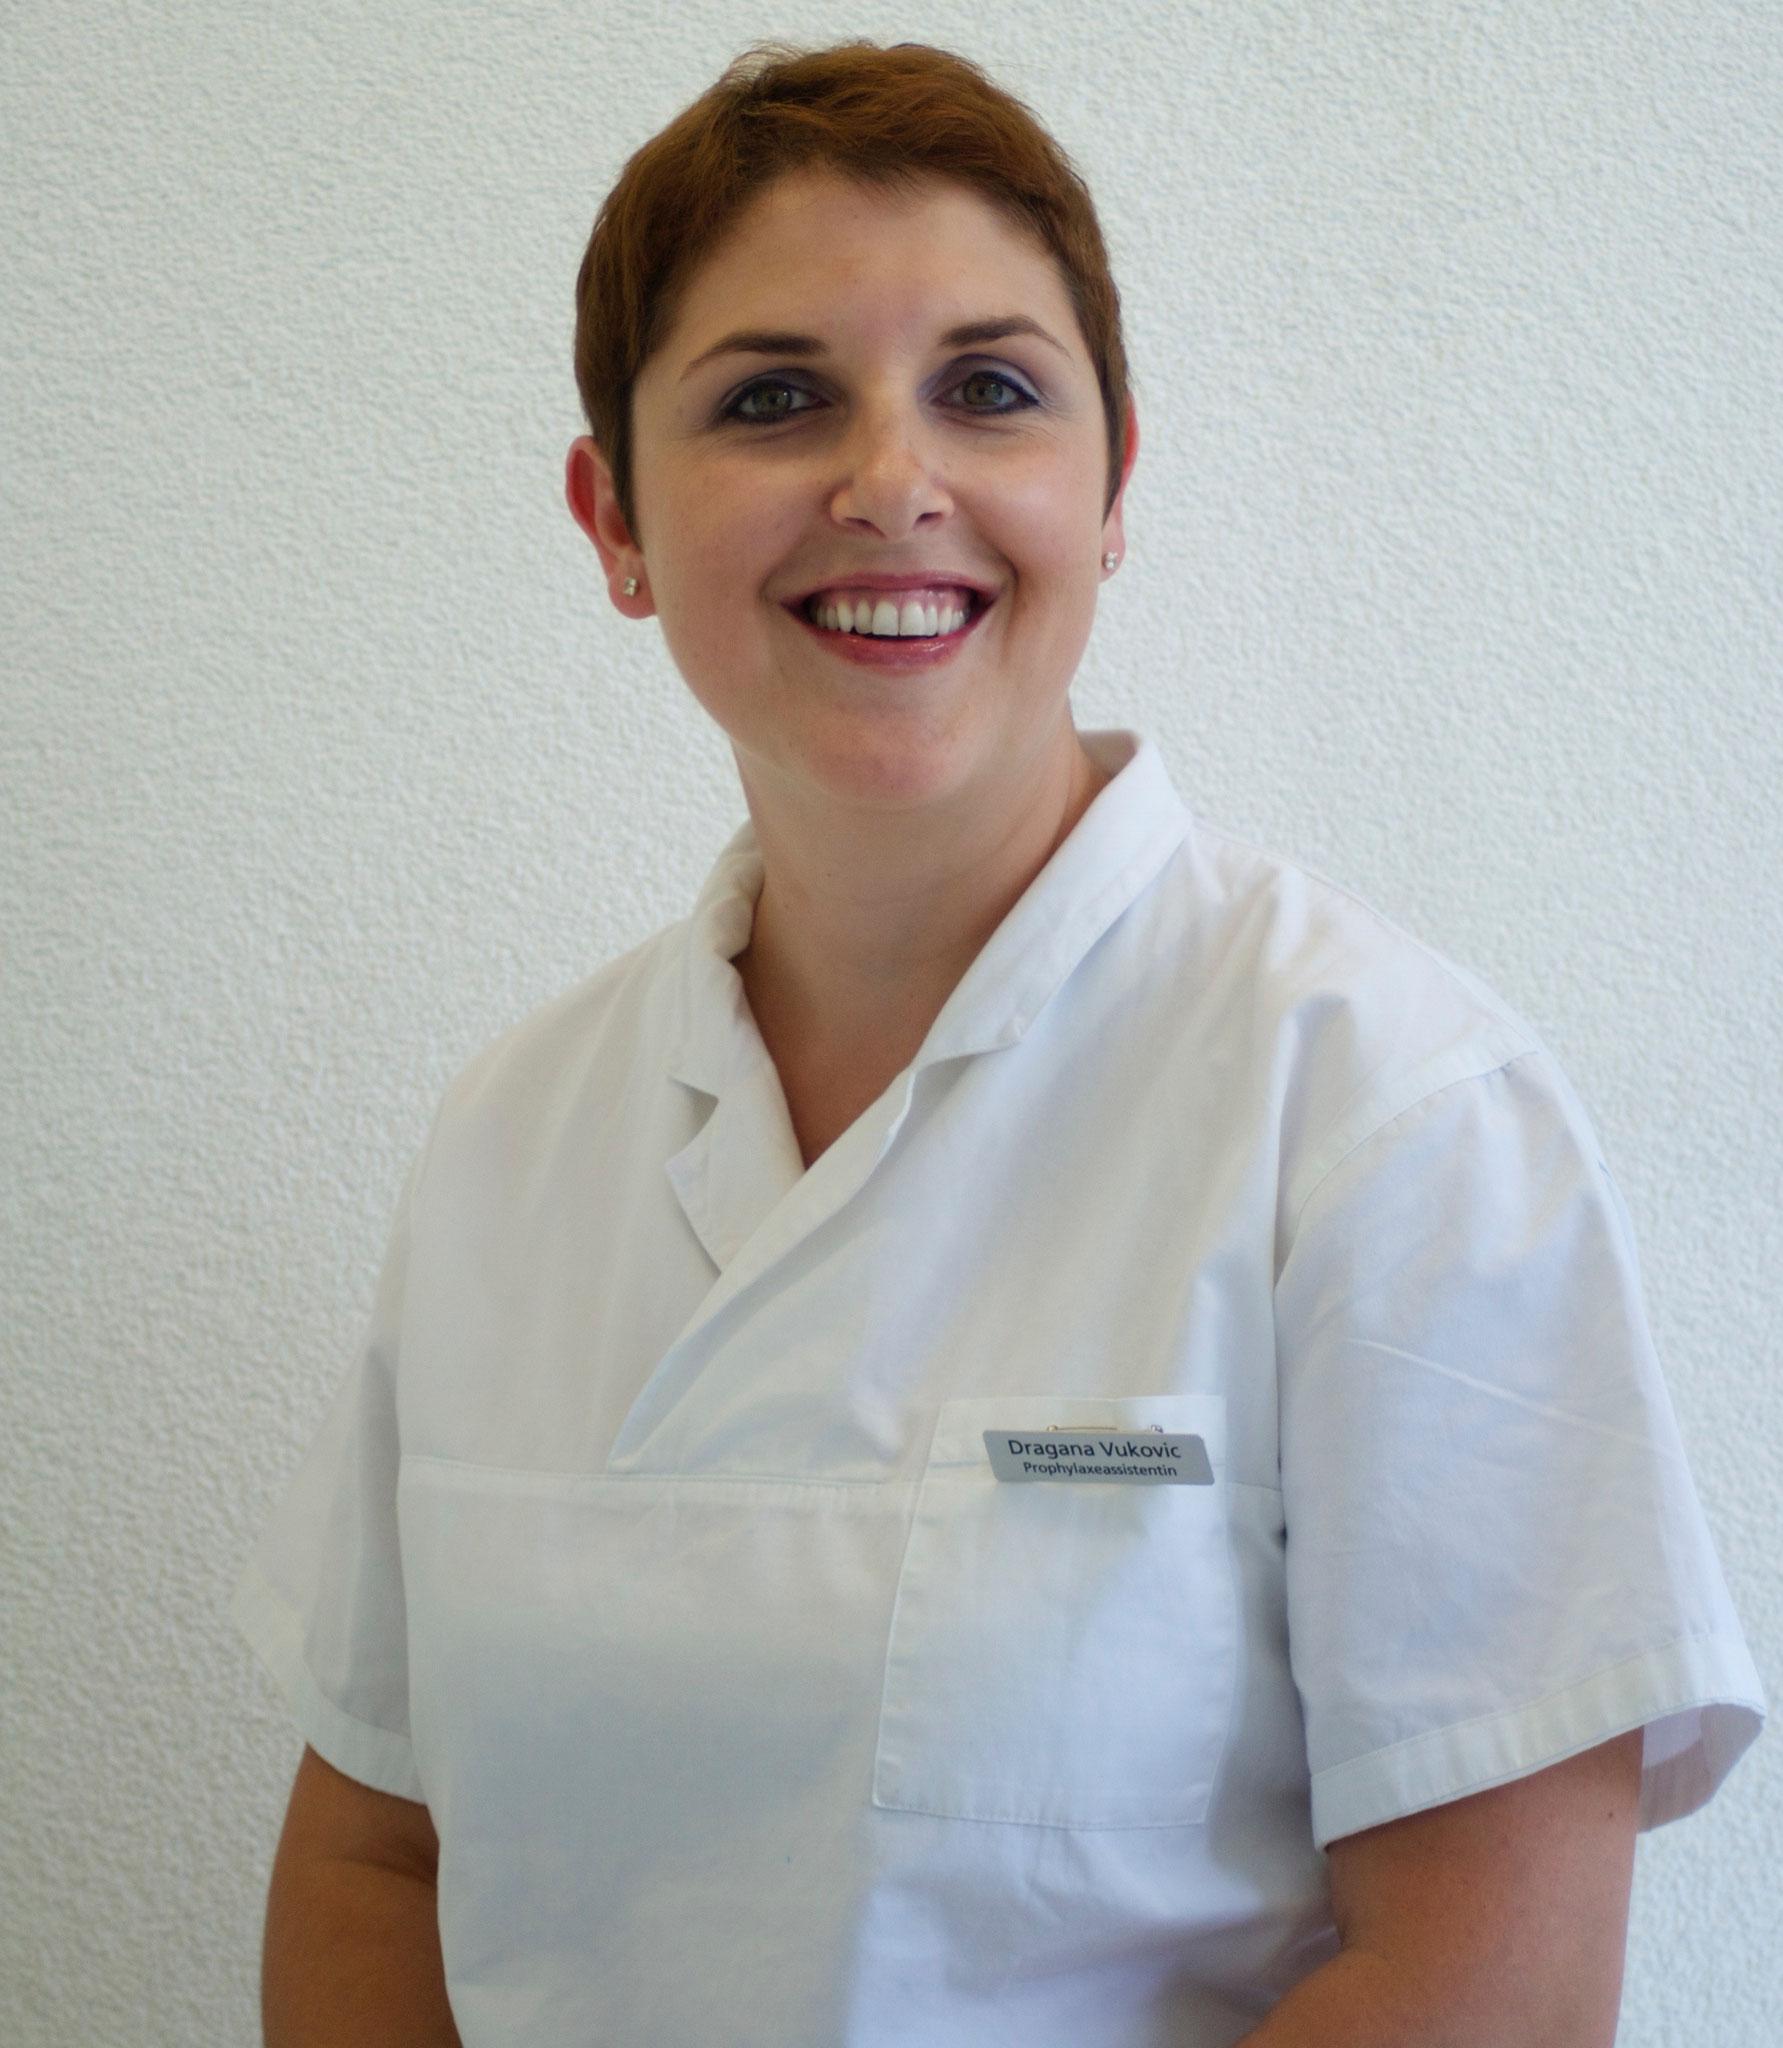 Fr. D. Vukovic, Erstgehilfin und Prophylaxeassistentin